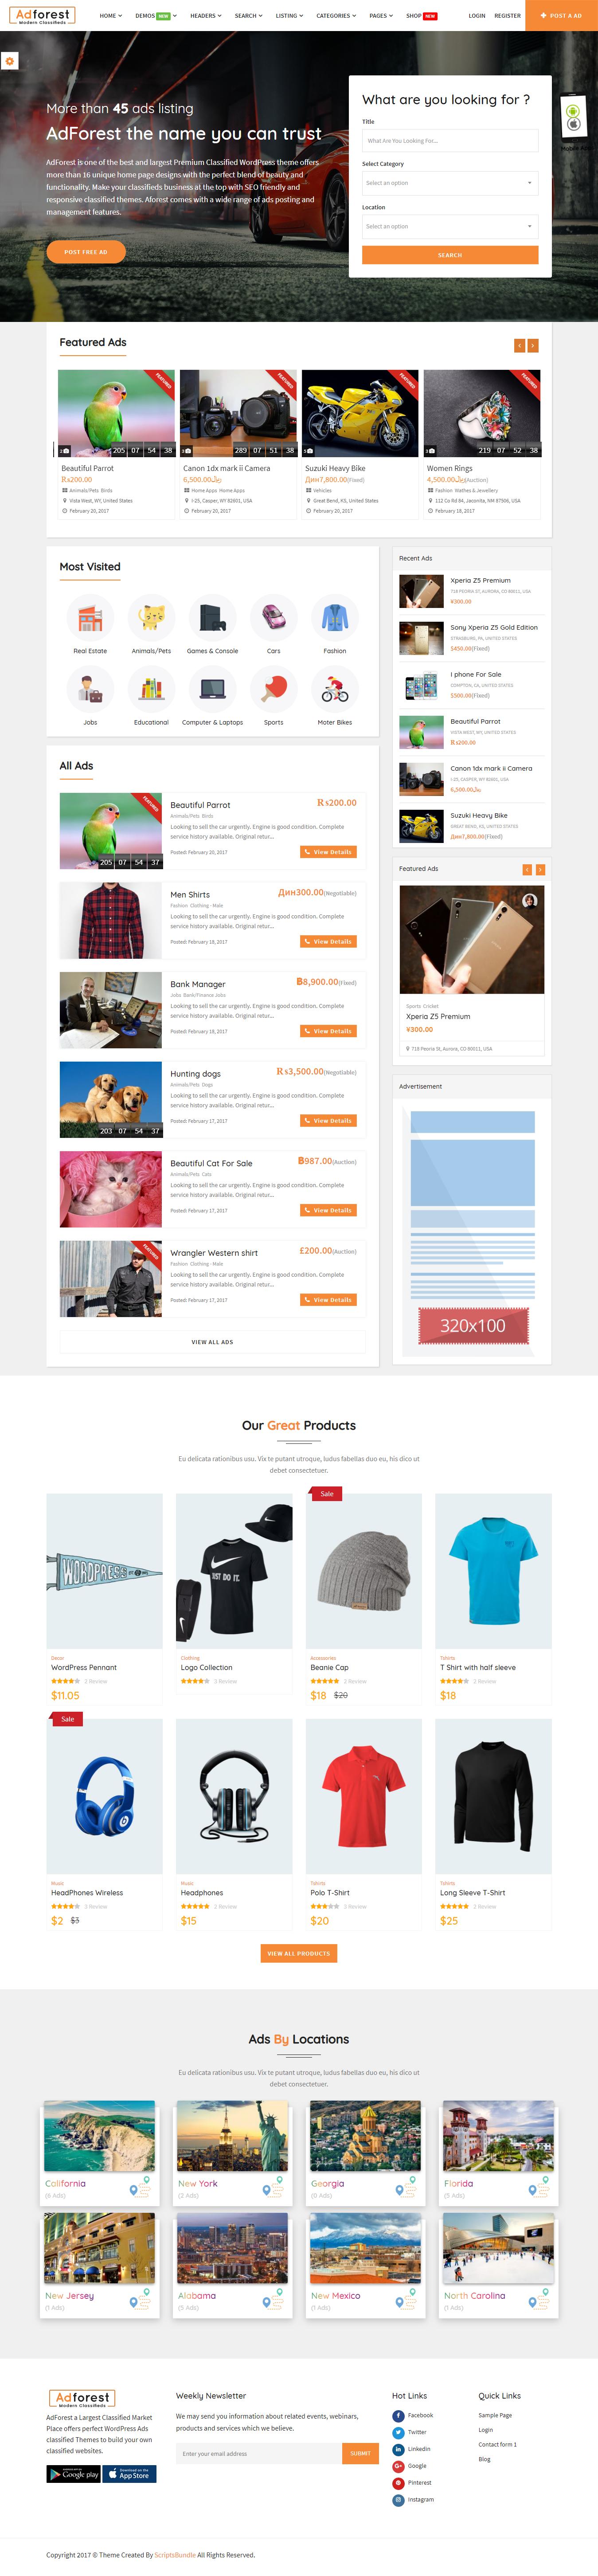 adforest best premium classified wordpress theme - 10+ Best Premium Classified WordPress Themes